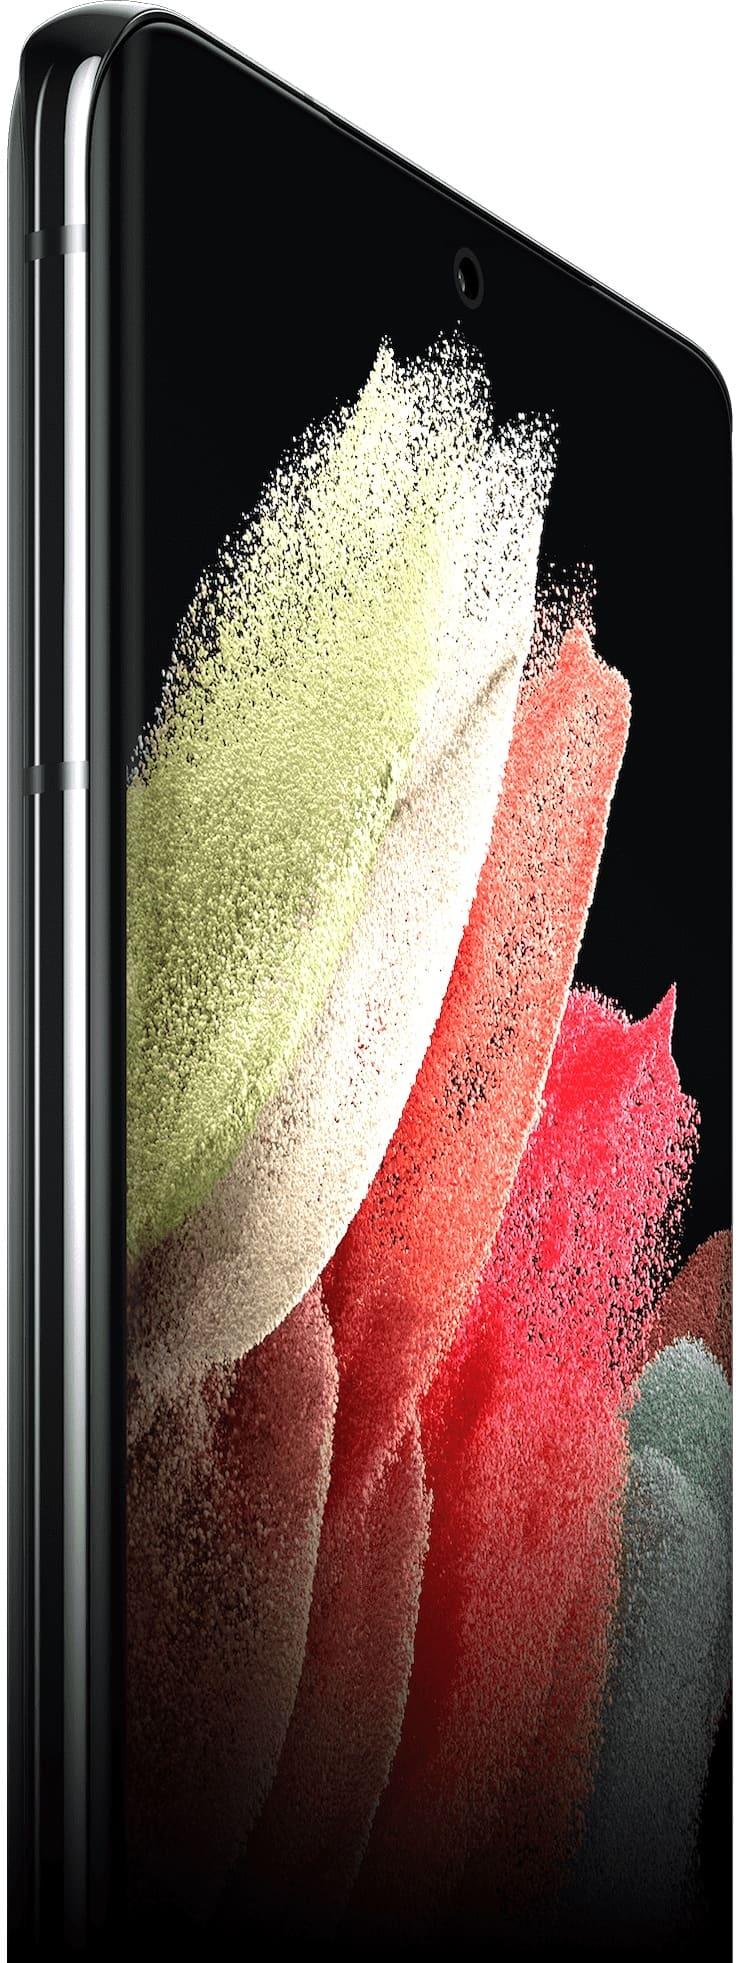 Экран Samsung Galaxy S21, S21+ и S21 Ultra